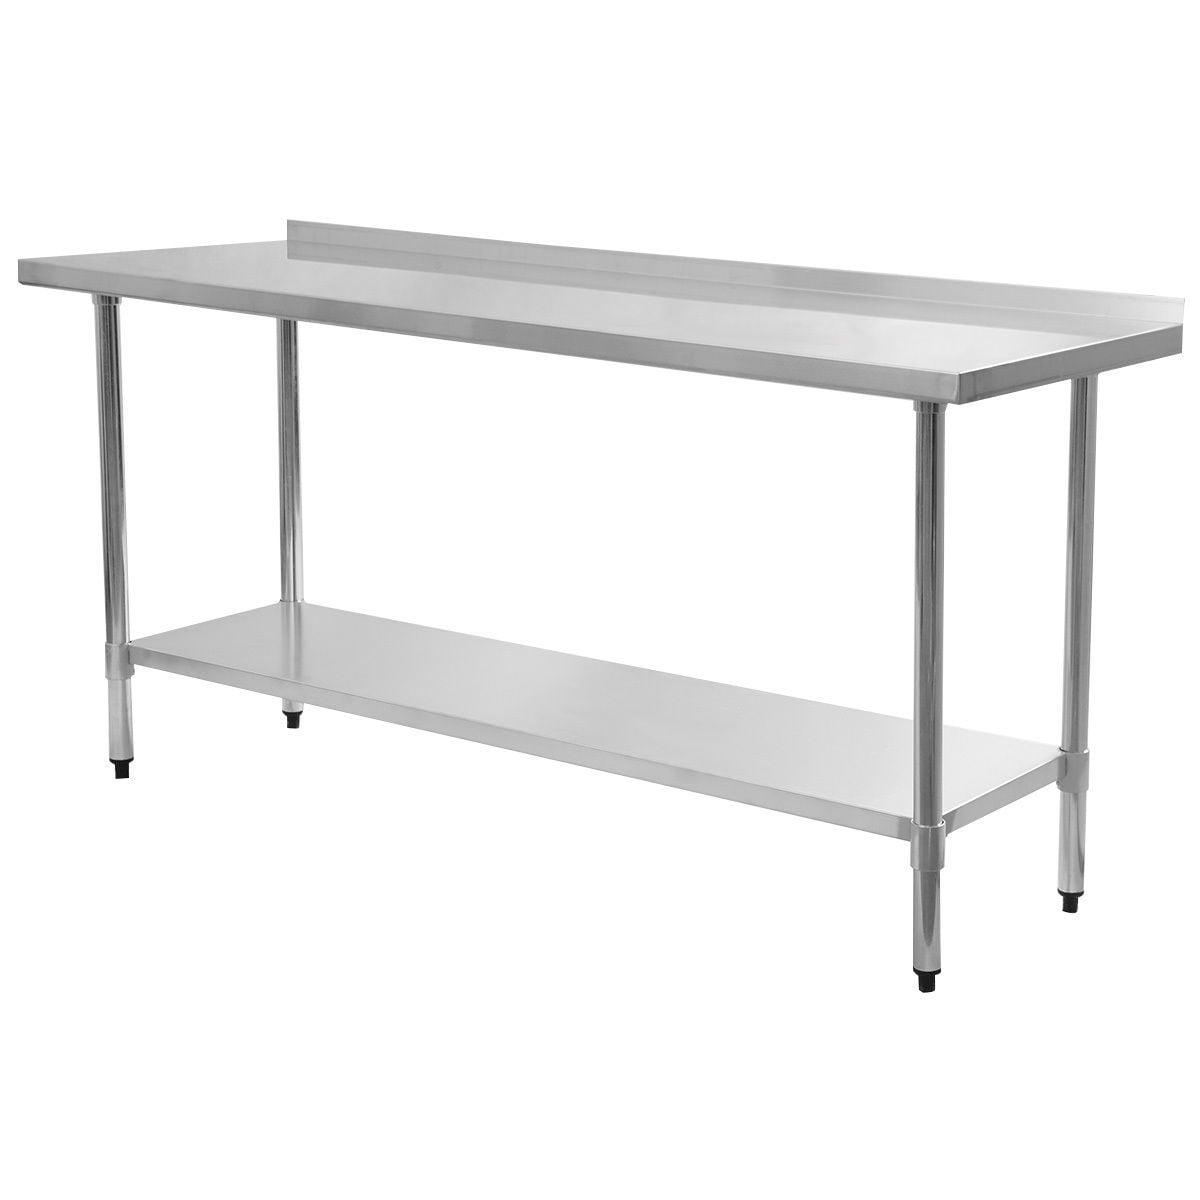 Shop Costway 24u0027u0027 X 72u0027u0027 Stainless Steel Work Prep Table With Backsplash  Kitchen Restaurant   Free Shipping Today   Overstock.com   18539206